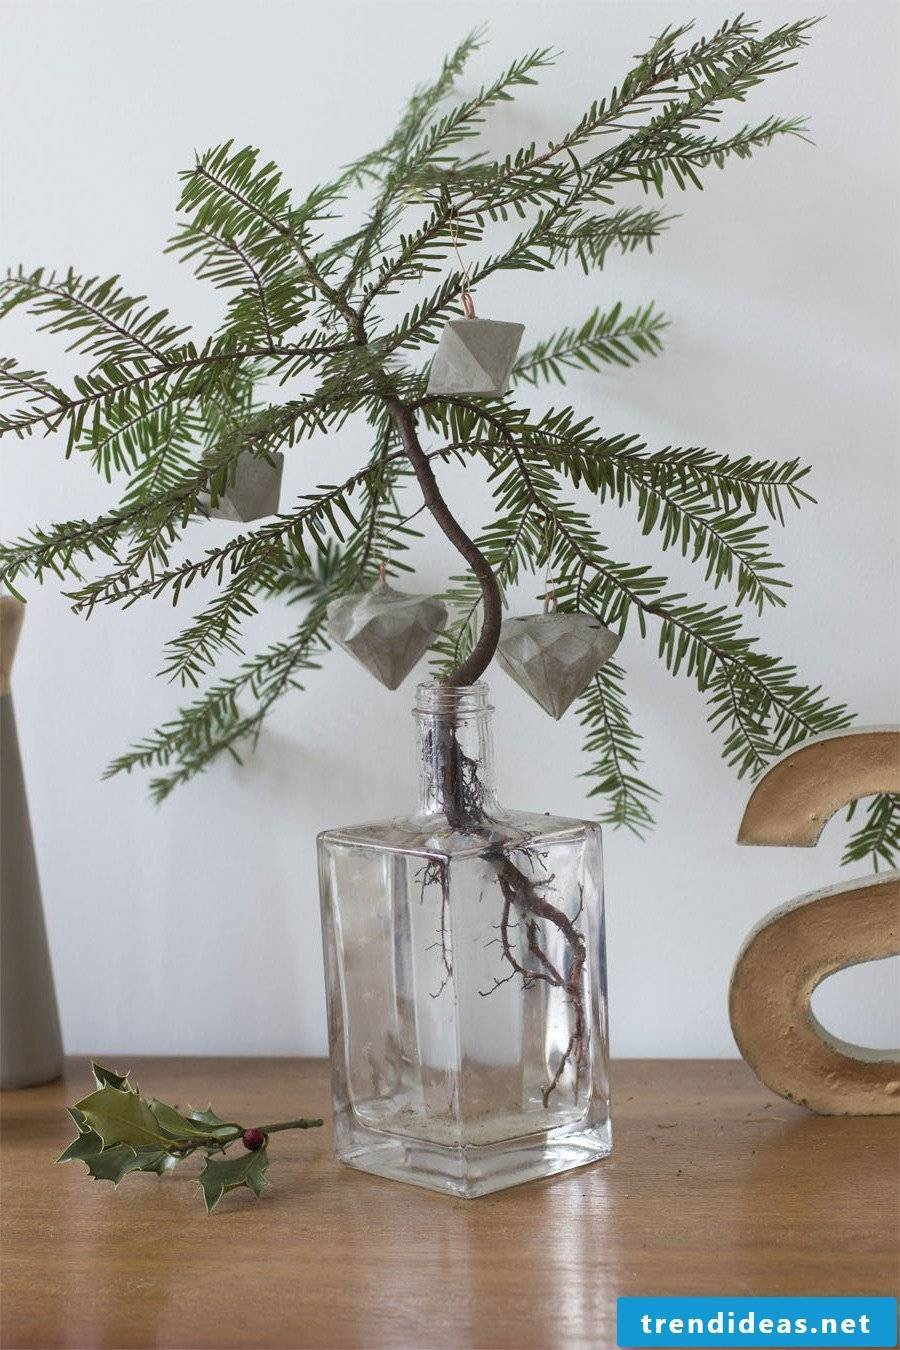 Concrete decoration Christmas tree decorations